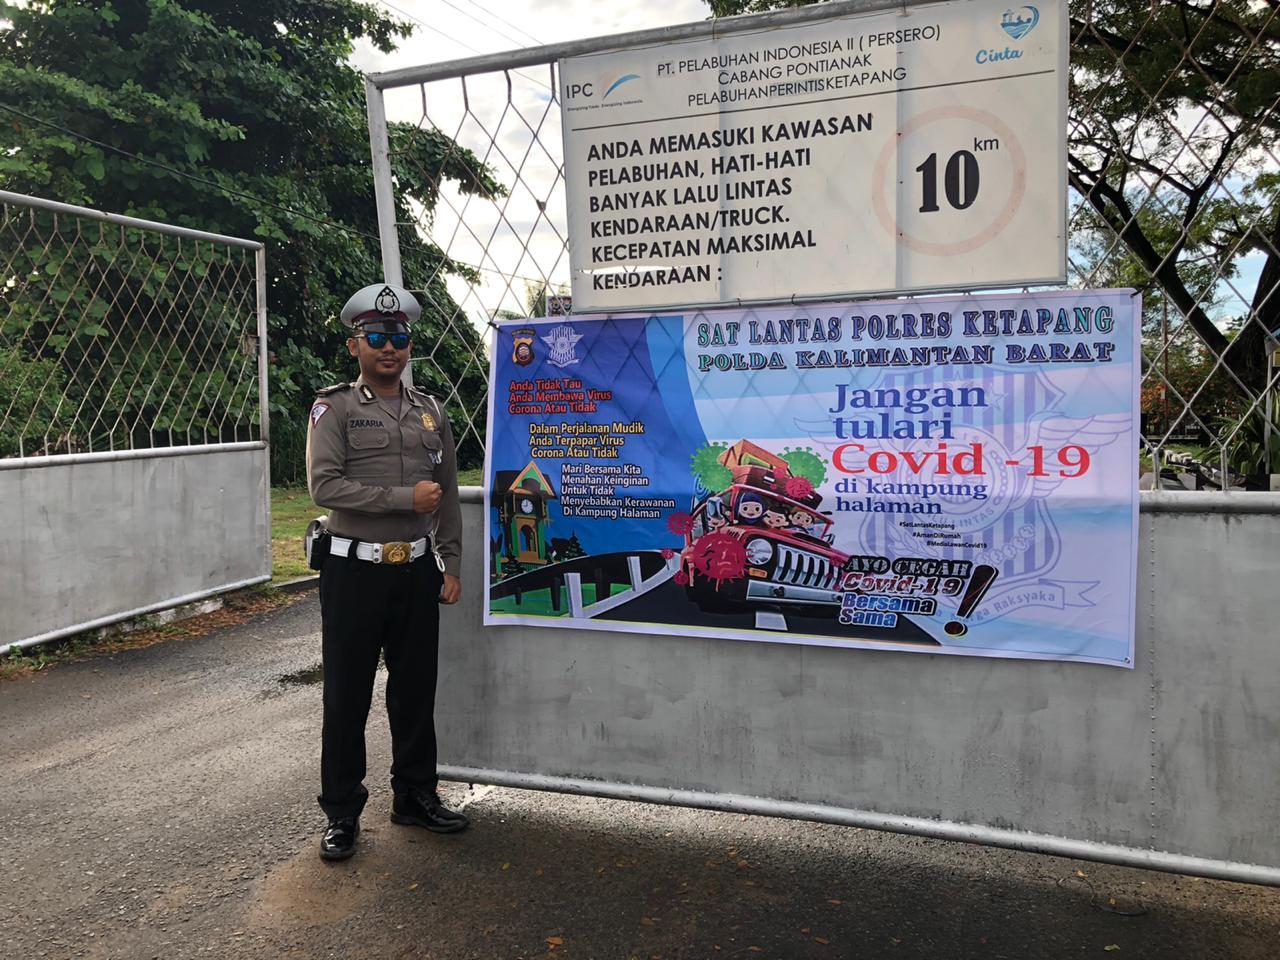 Gelar Ops Keselamatan Kapuas 2020, Sat Lantas Polres Ketapang Himbau Masyarakat Cegah Covid-19